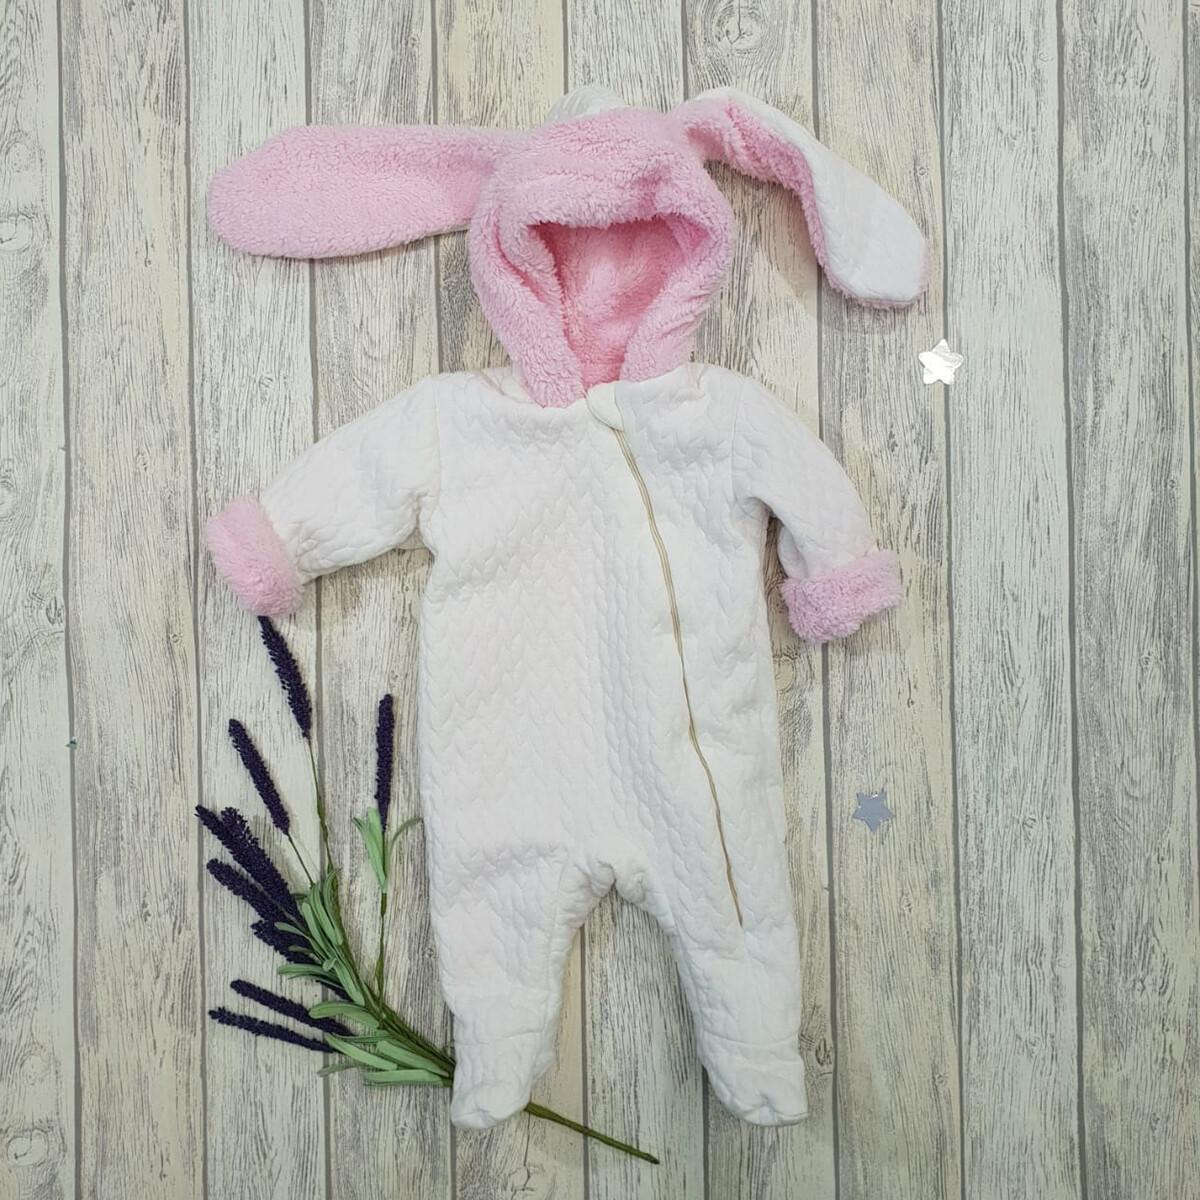 Комбинезон на молнии «Кролик», молочно-розовый